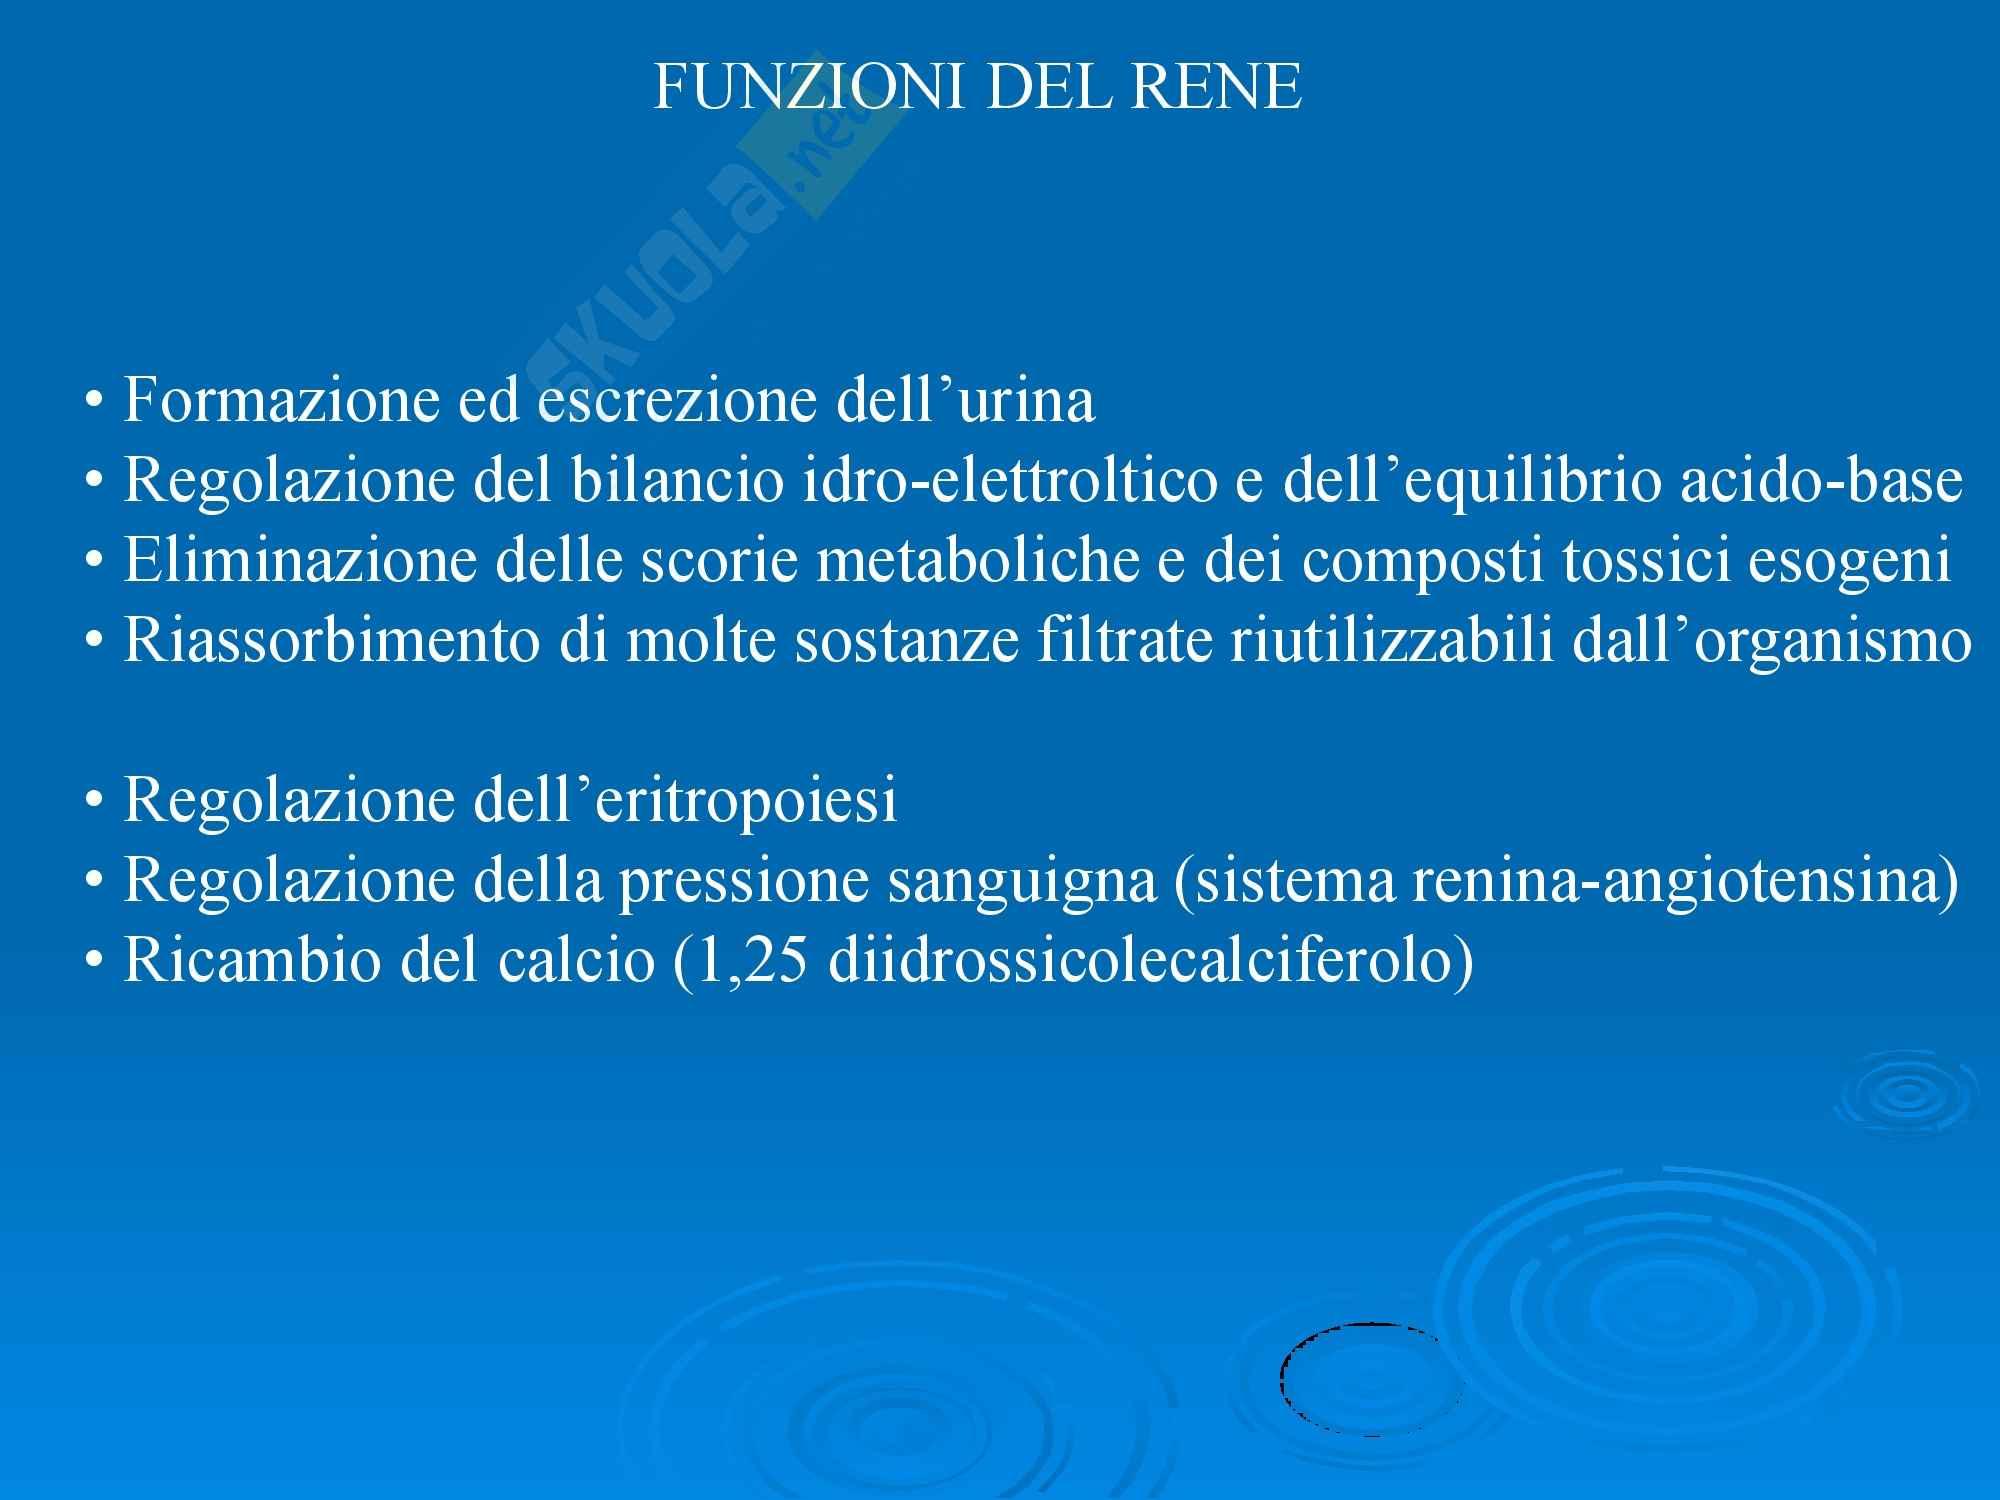 Fisiopatologia - Reni